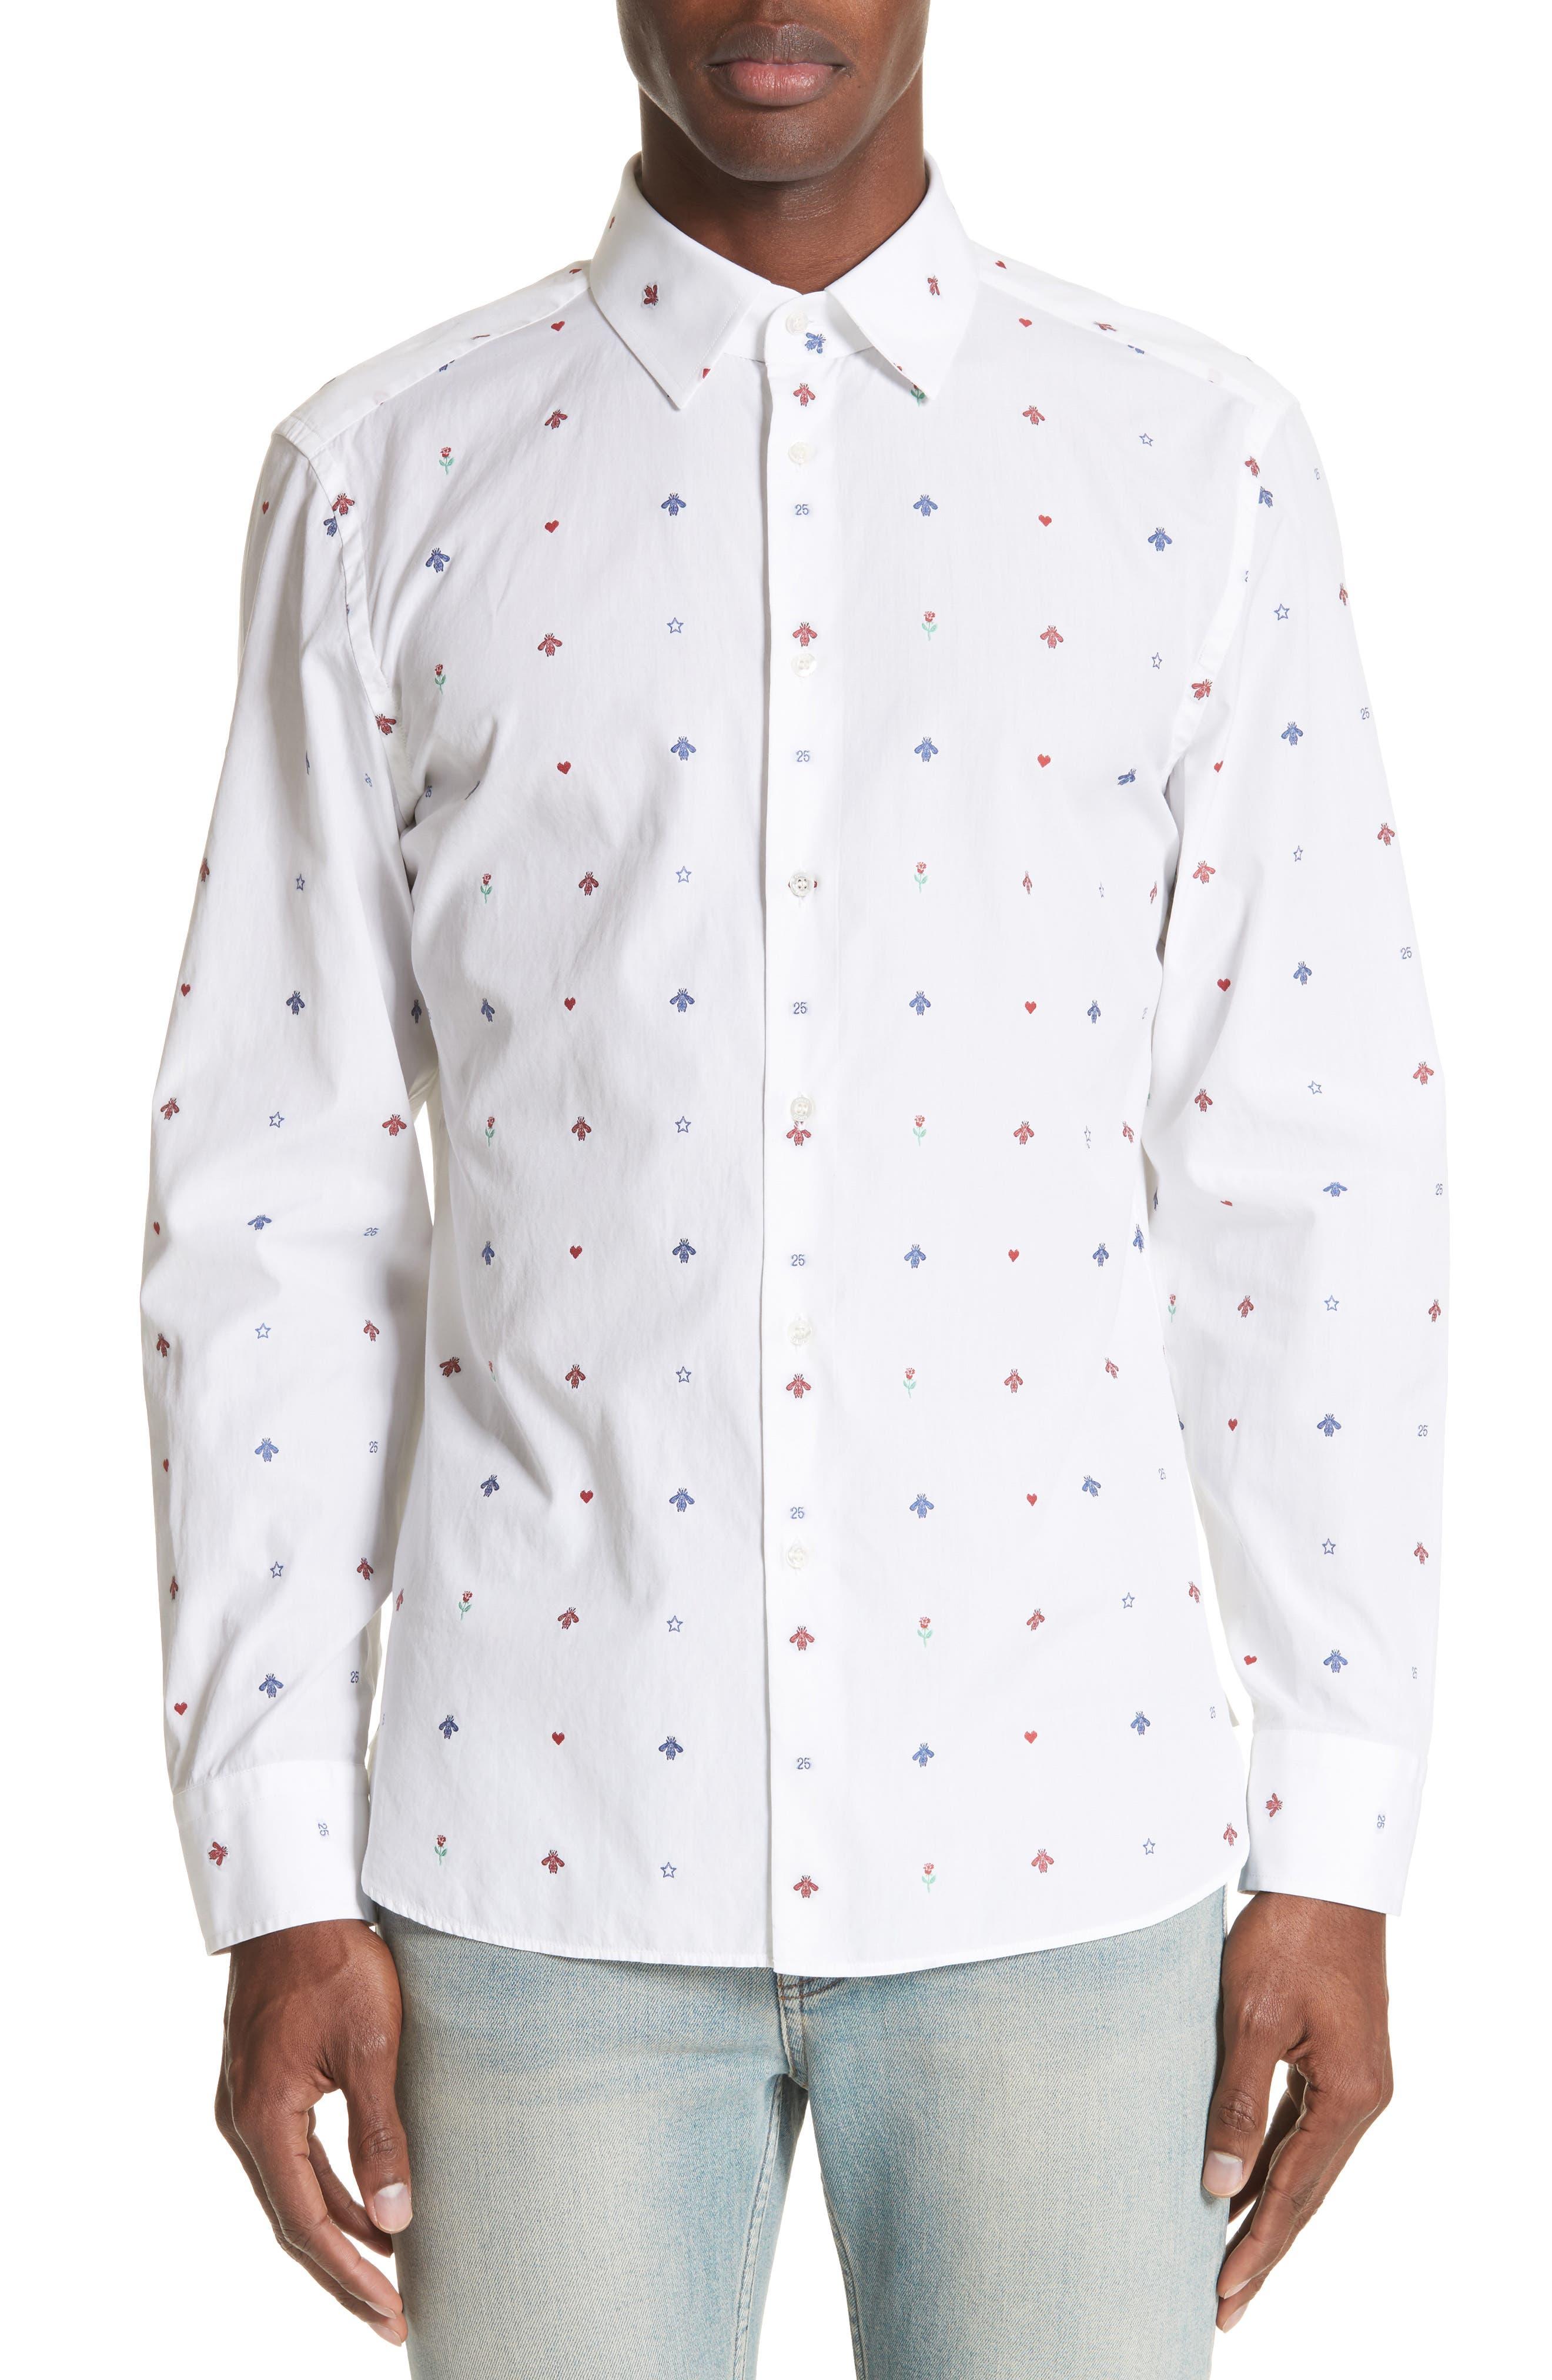 Gucci Allover Bee Print Woven Shirt